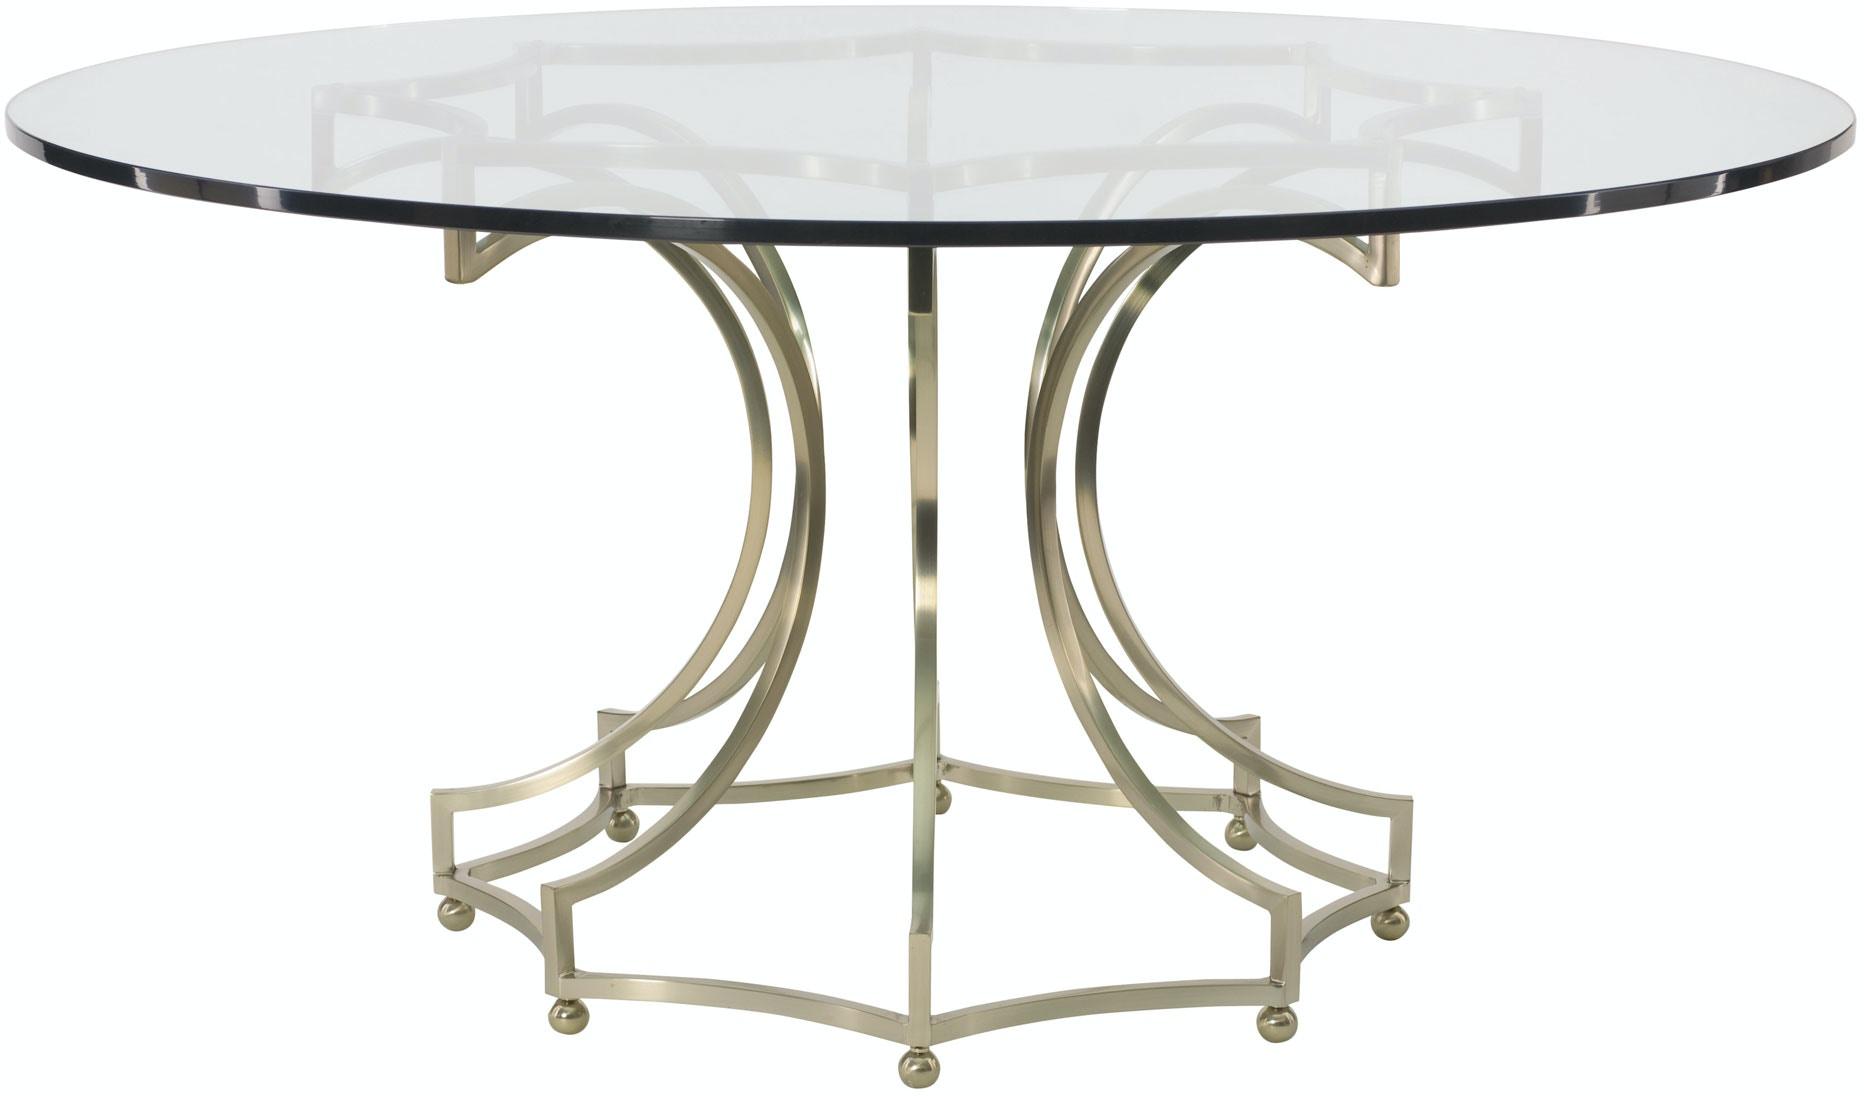 Bernhardt Furniture 360 773 998 E60 Dining Room Miramont  : 360 773 998 e60 from www.goodshomefurnishings.com size 1024 x 768 jpeg 29kB